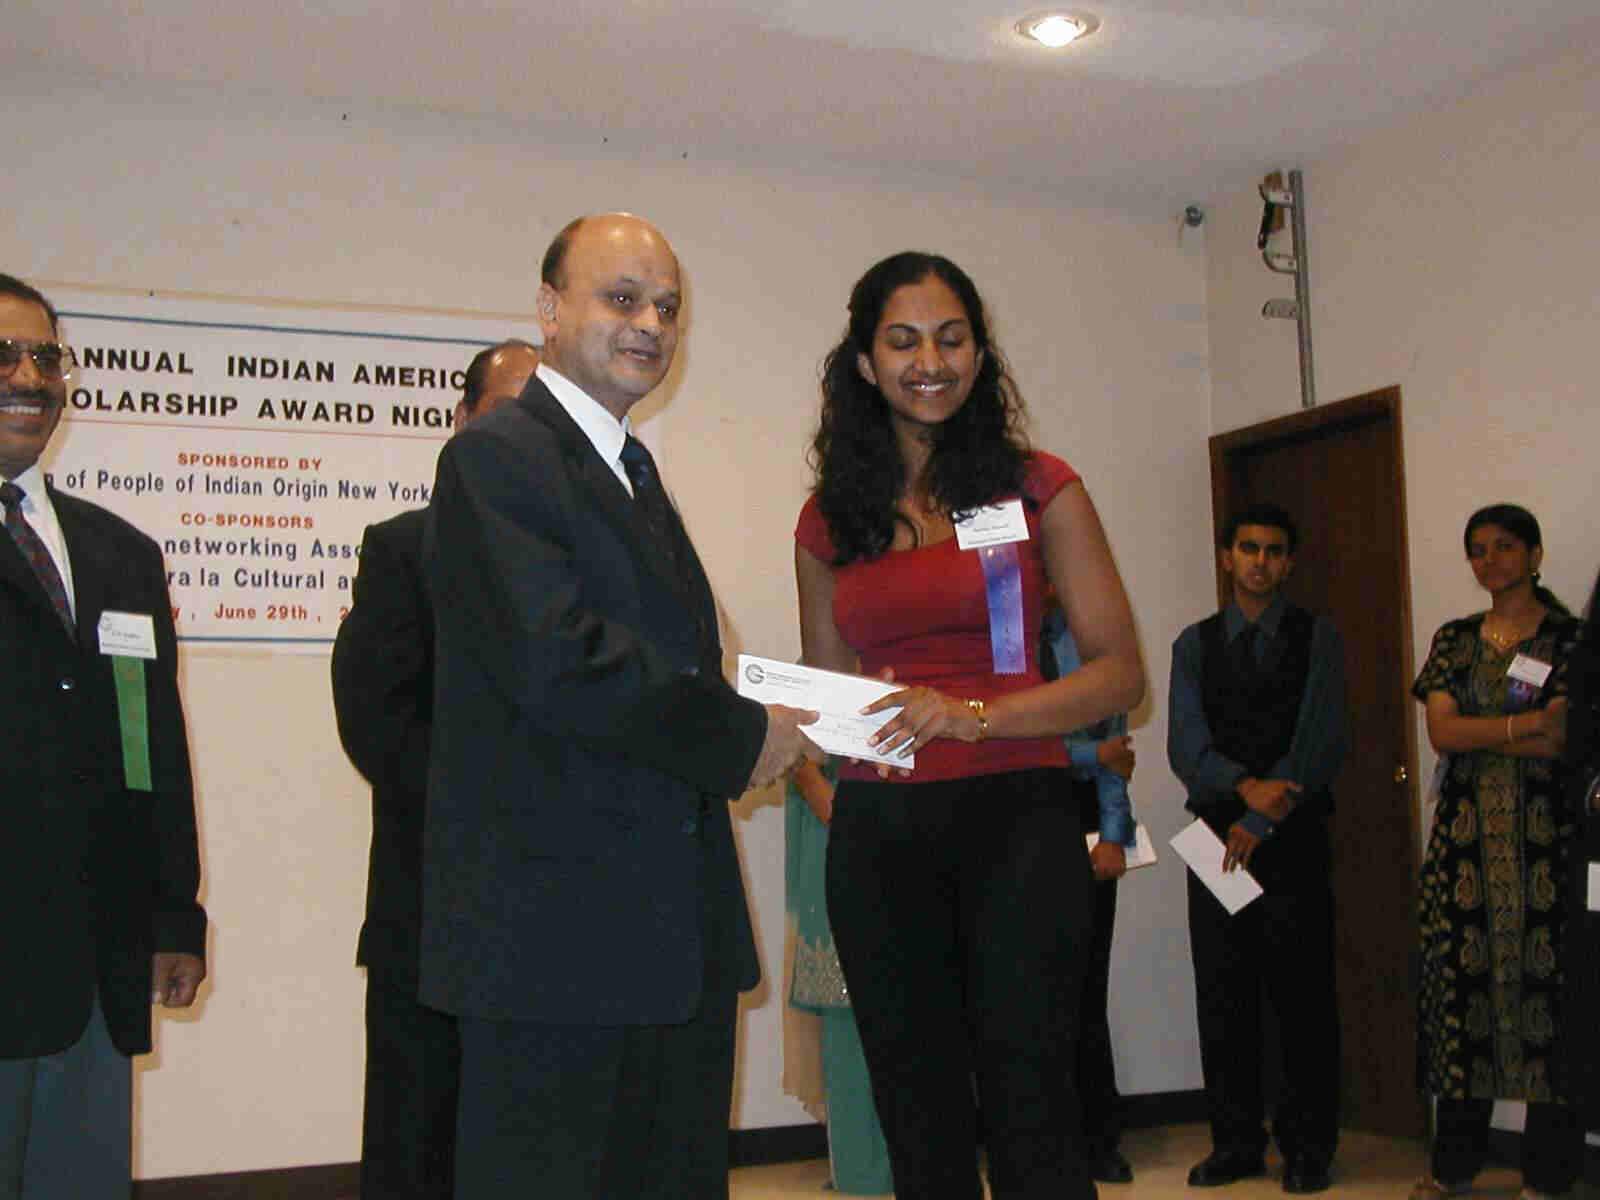 consul general pramathesh rath presenting the outstanding academic achievement scholarship award 2000 to sarika bansal of ramapo high school